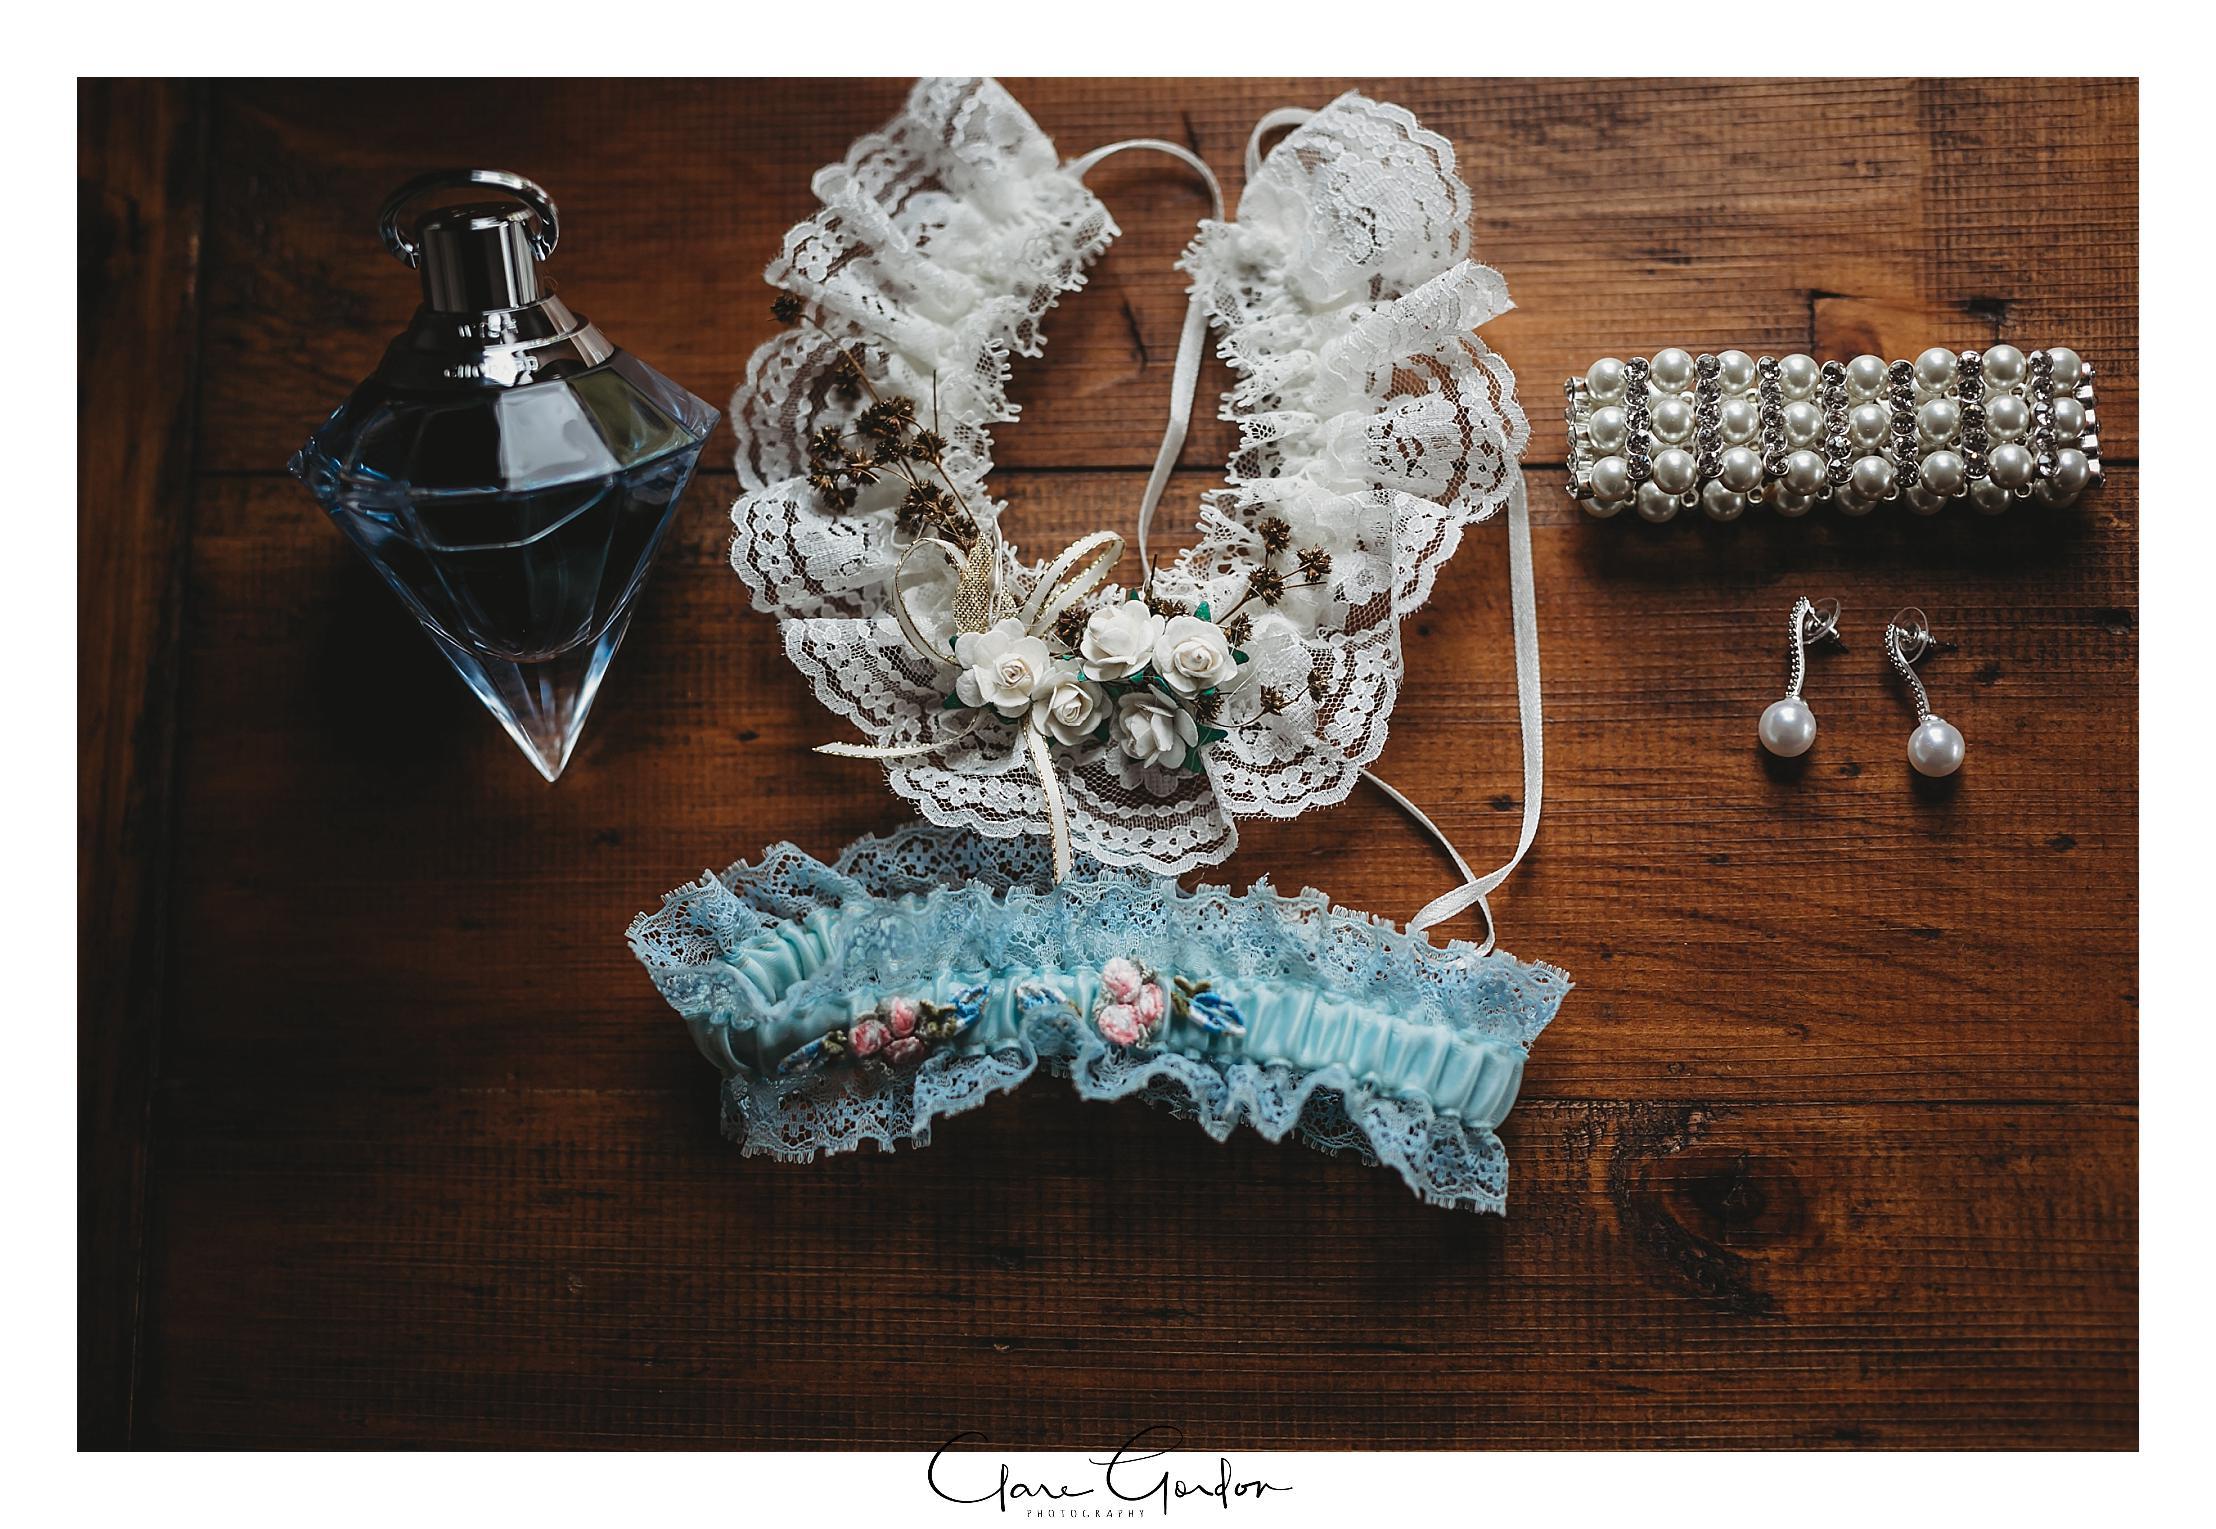 Waikato-wedding-photographer-Forest-weddnig-Hamilton-wedding-Newzealand (13).jpg